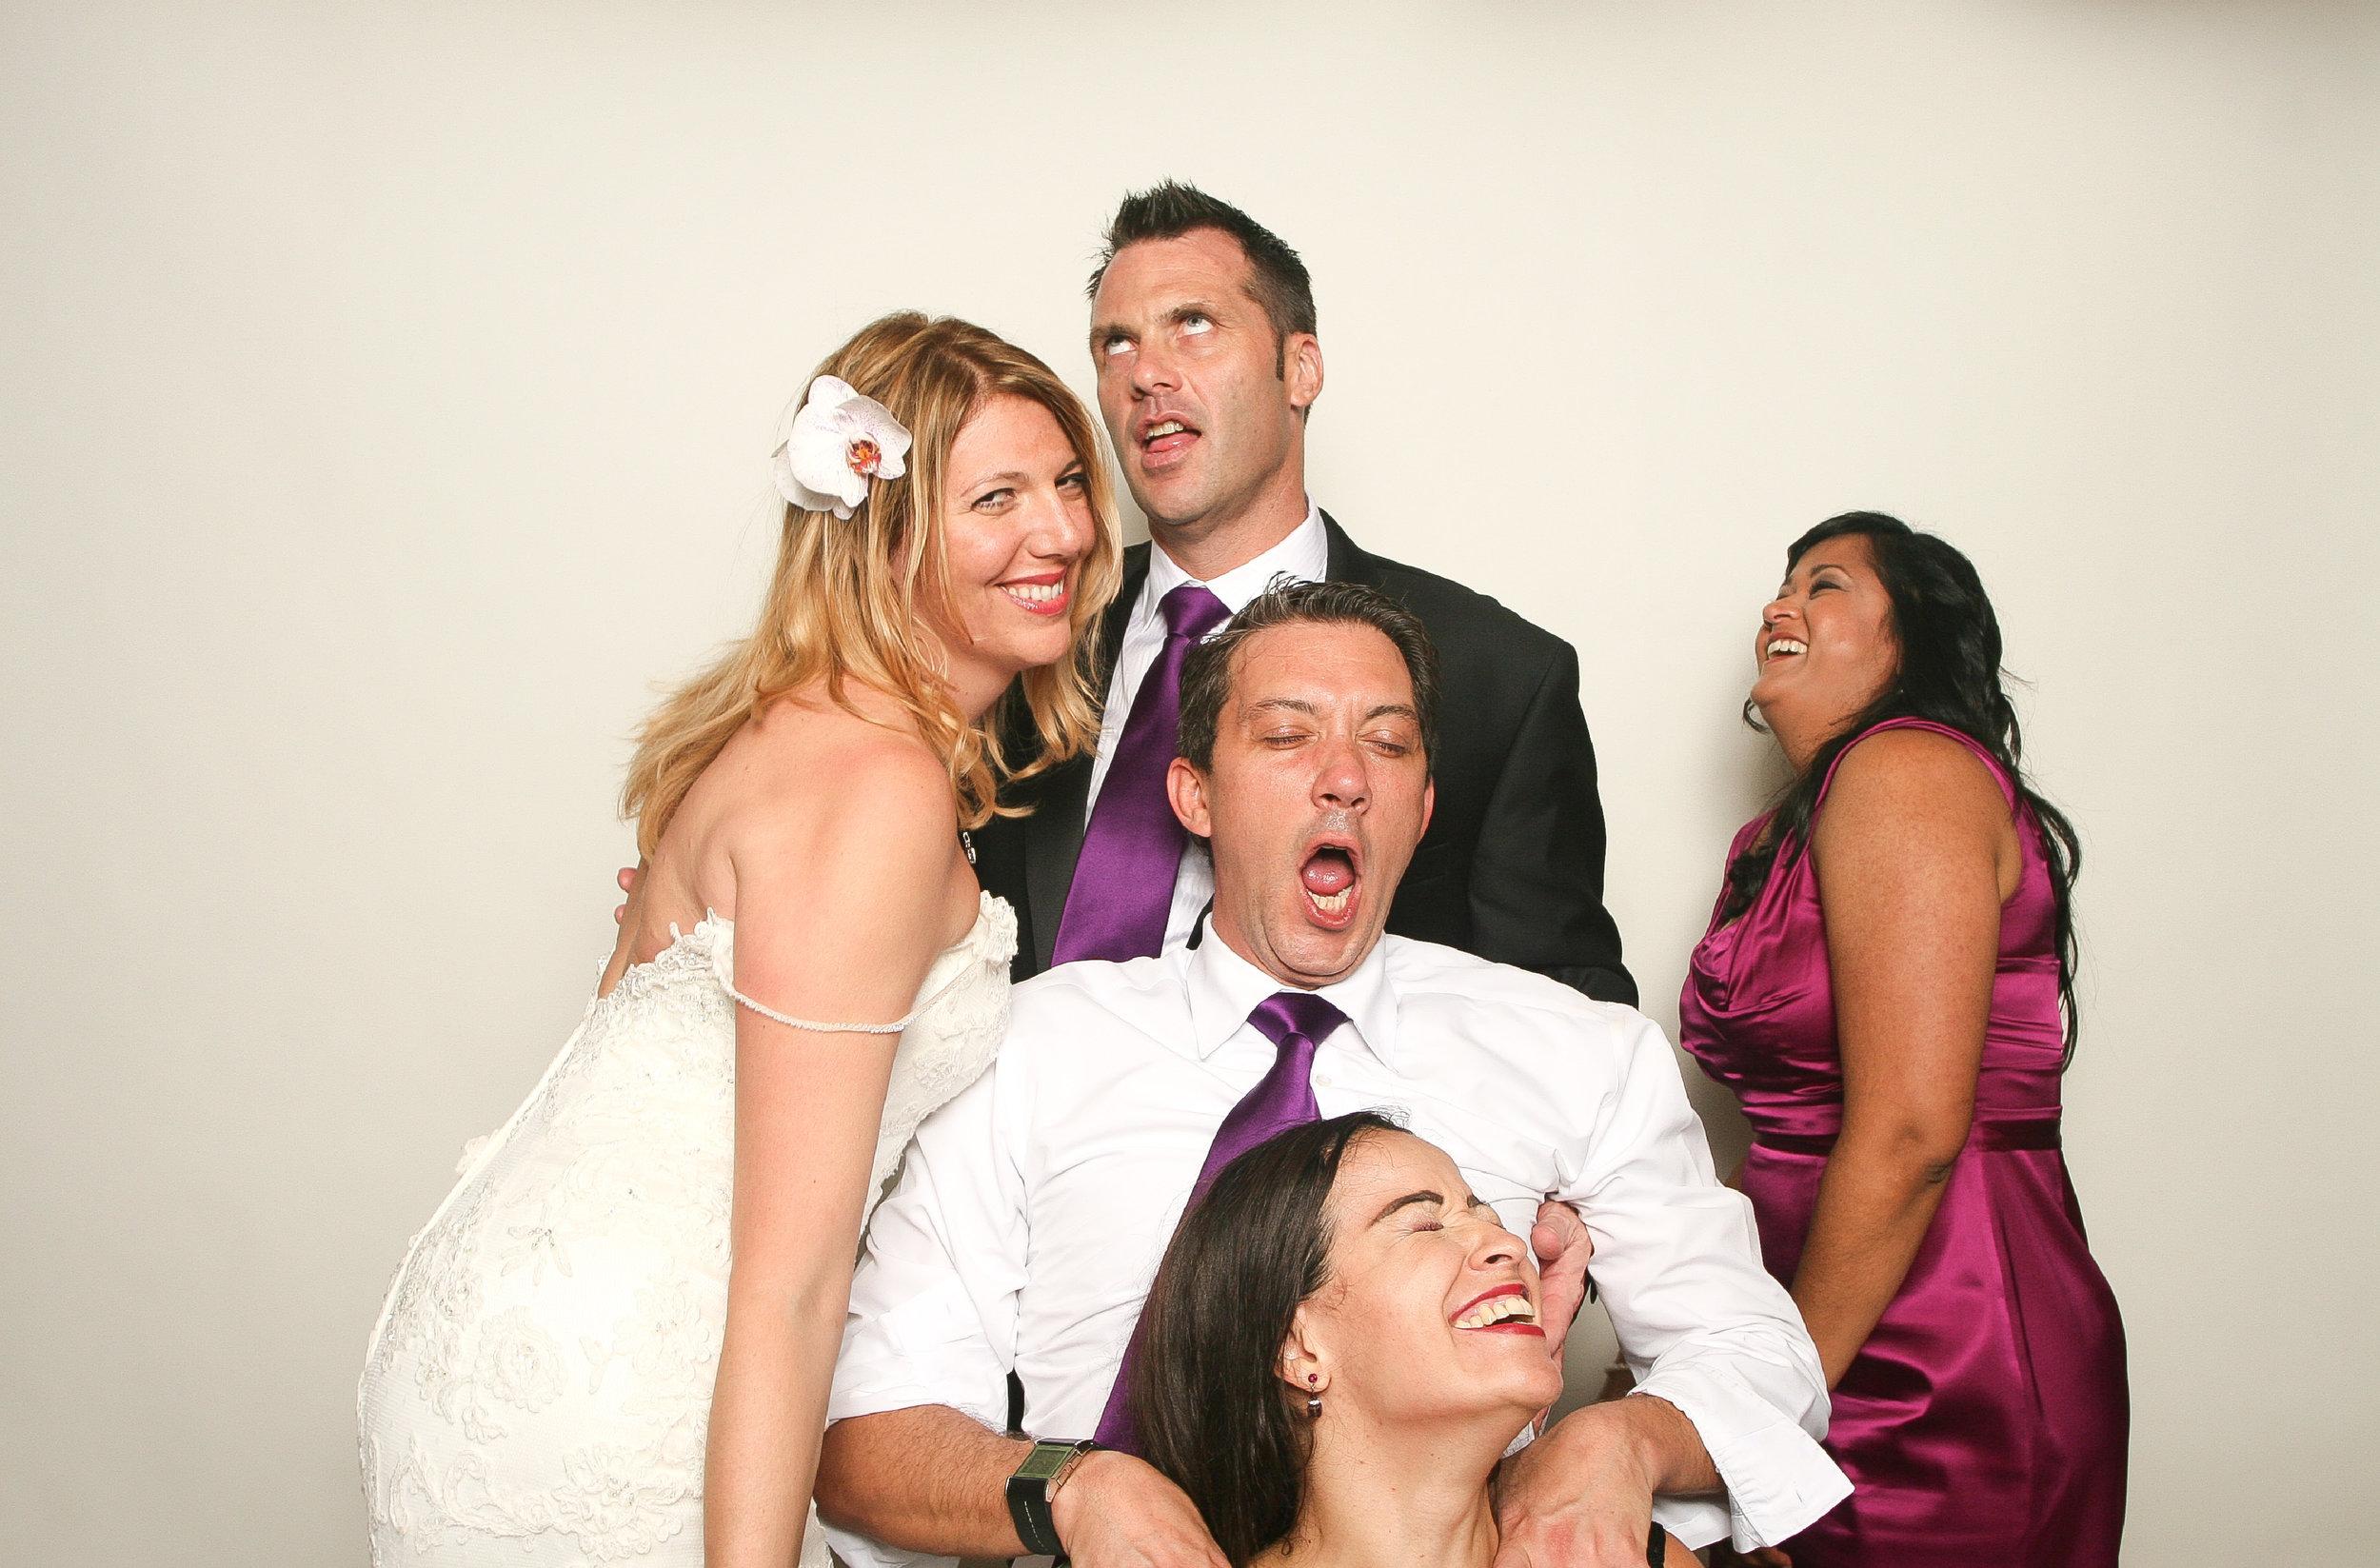 South Florida Miami Wedding Photobooth25.jpg